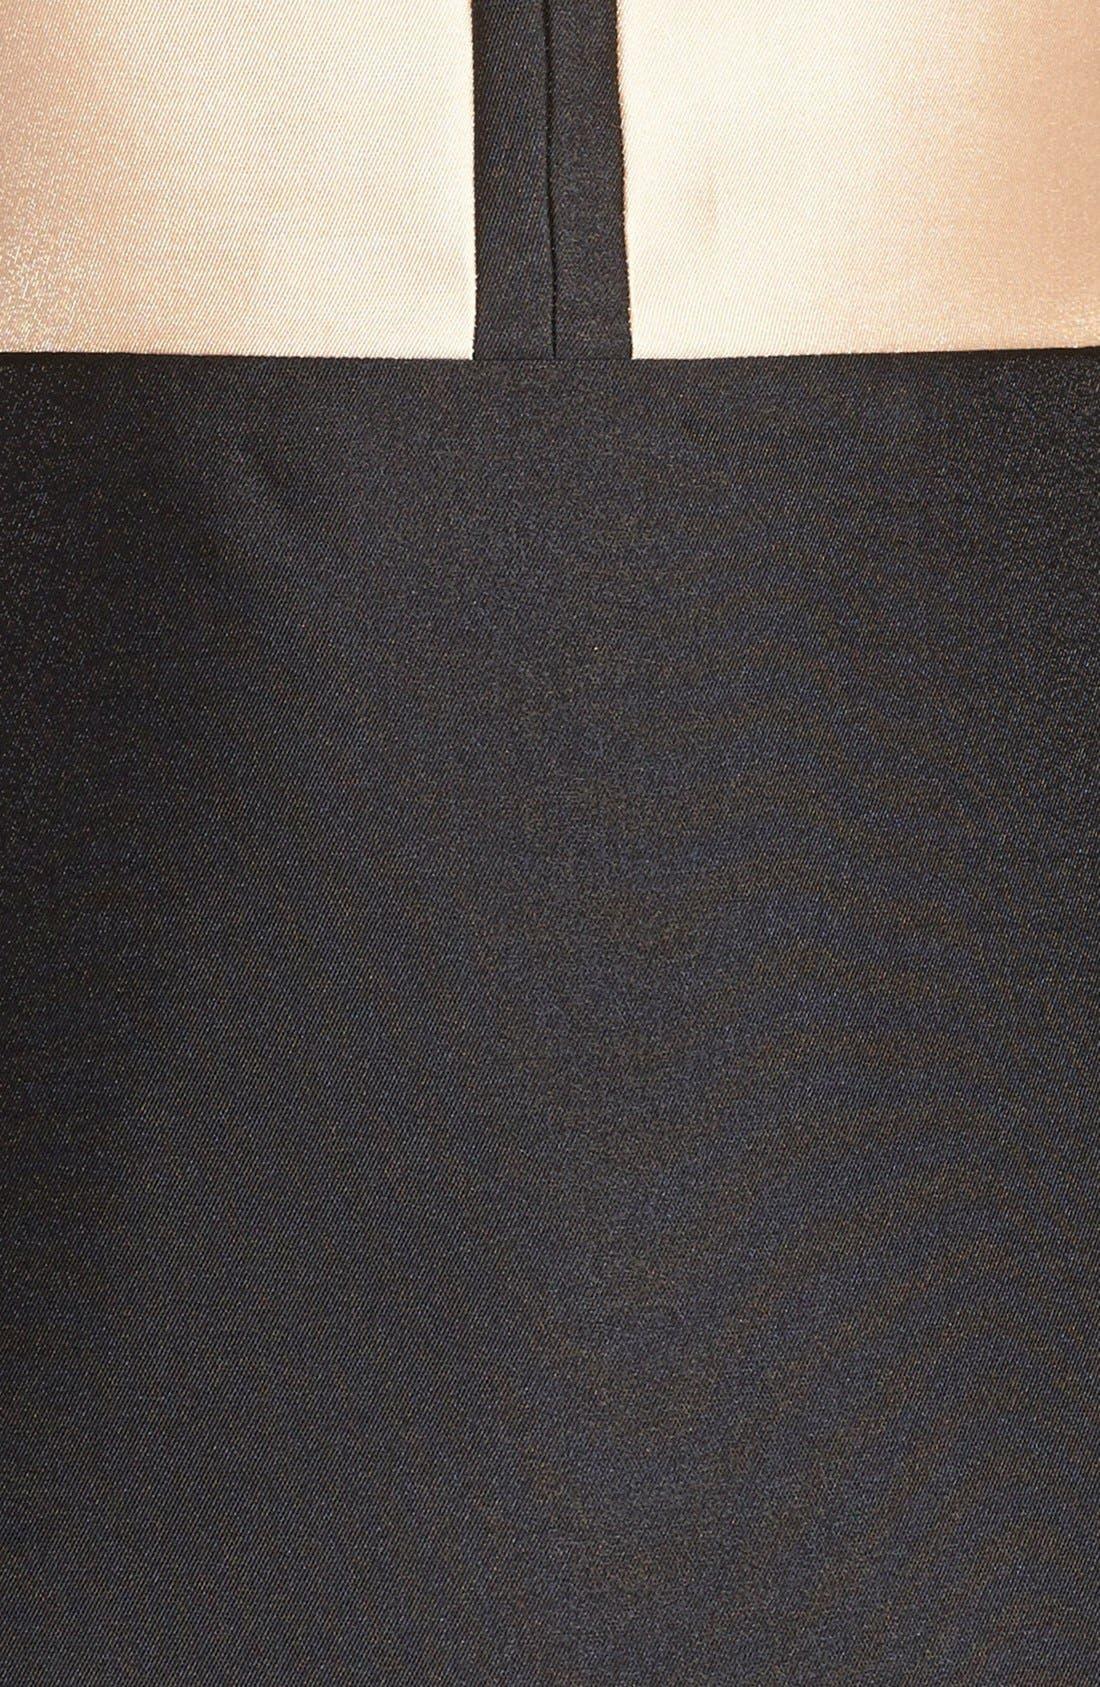 Alternate Image 4  - ERIN erin fetherston 'Eliza' Colorblock Twill Fit & Flare Dress